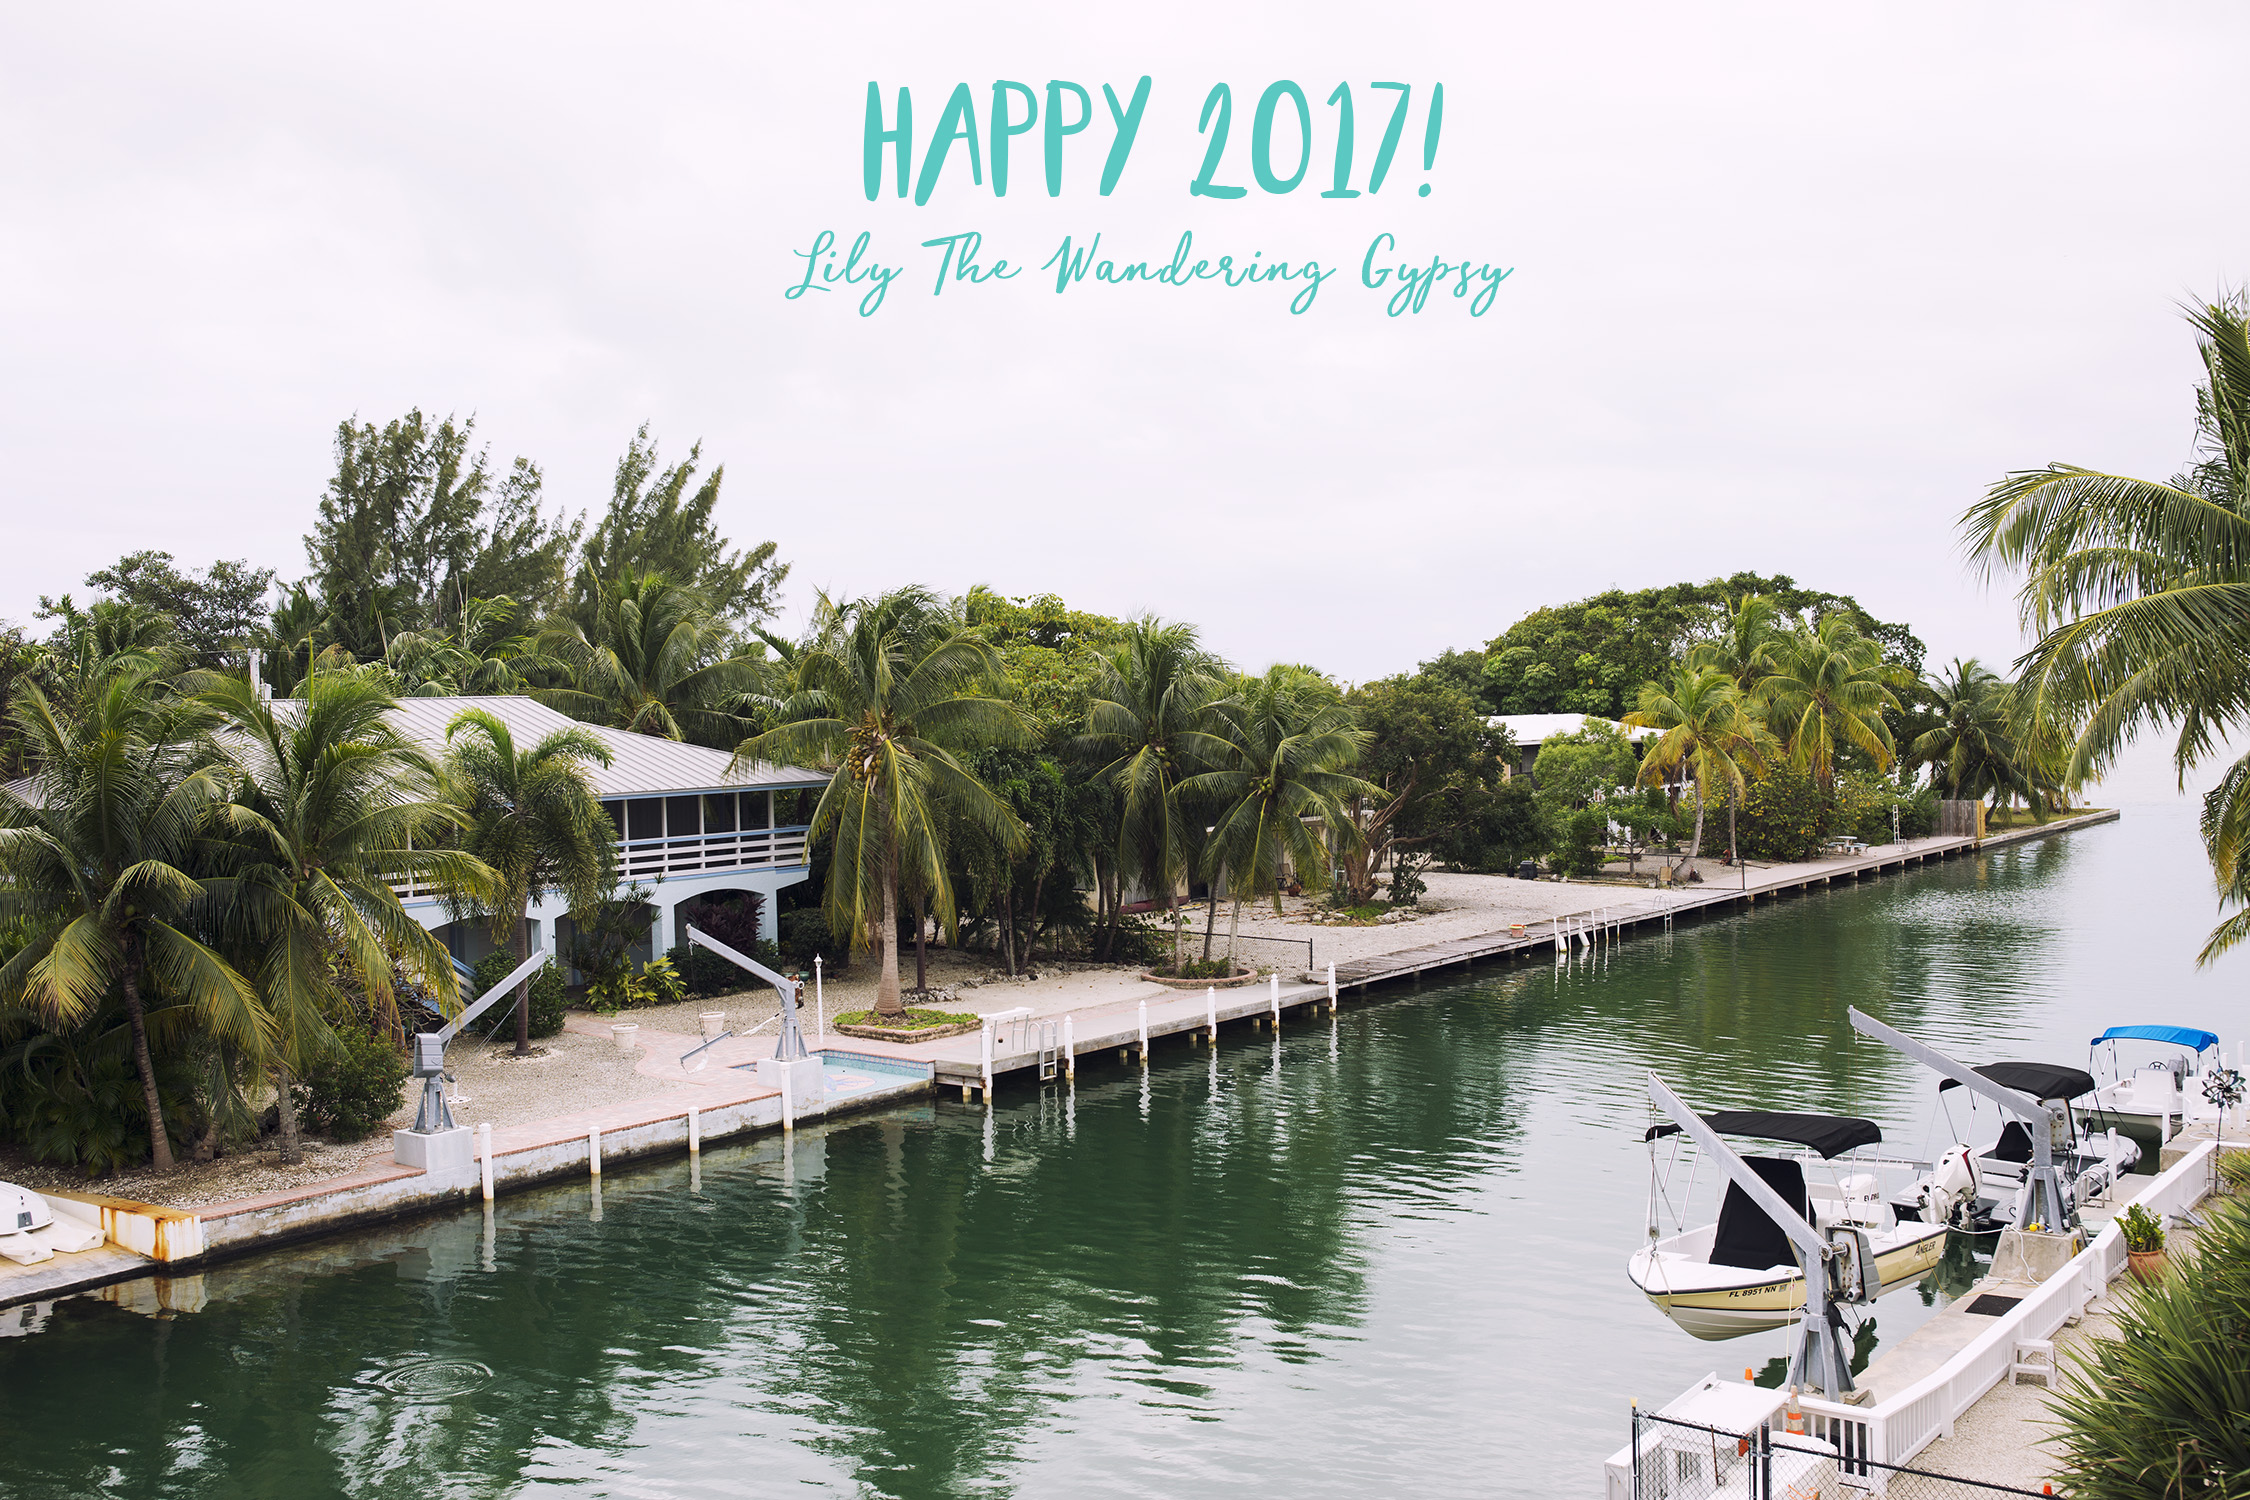 Happy 2017 From The Florida Keys!